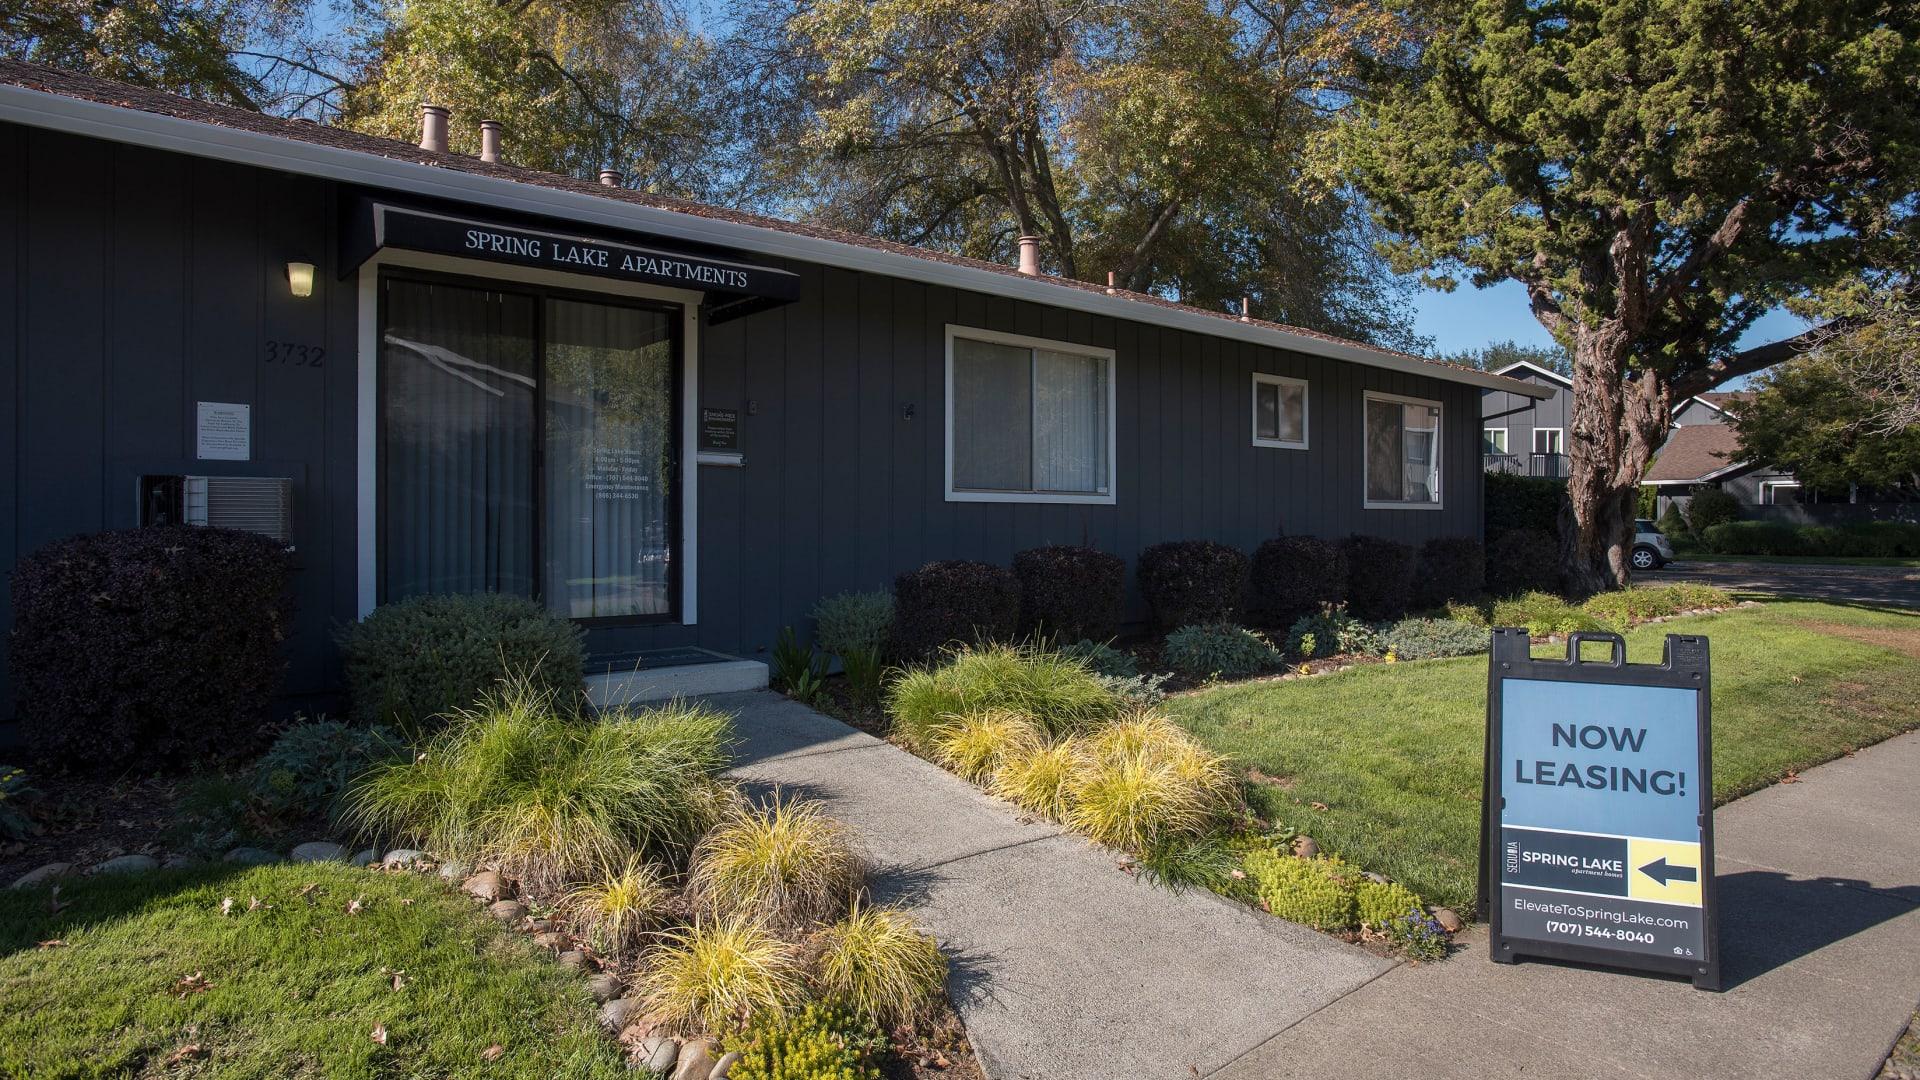 Leasing office at Spring Lake Apartment Homes in Santa Rosa, California